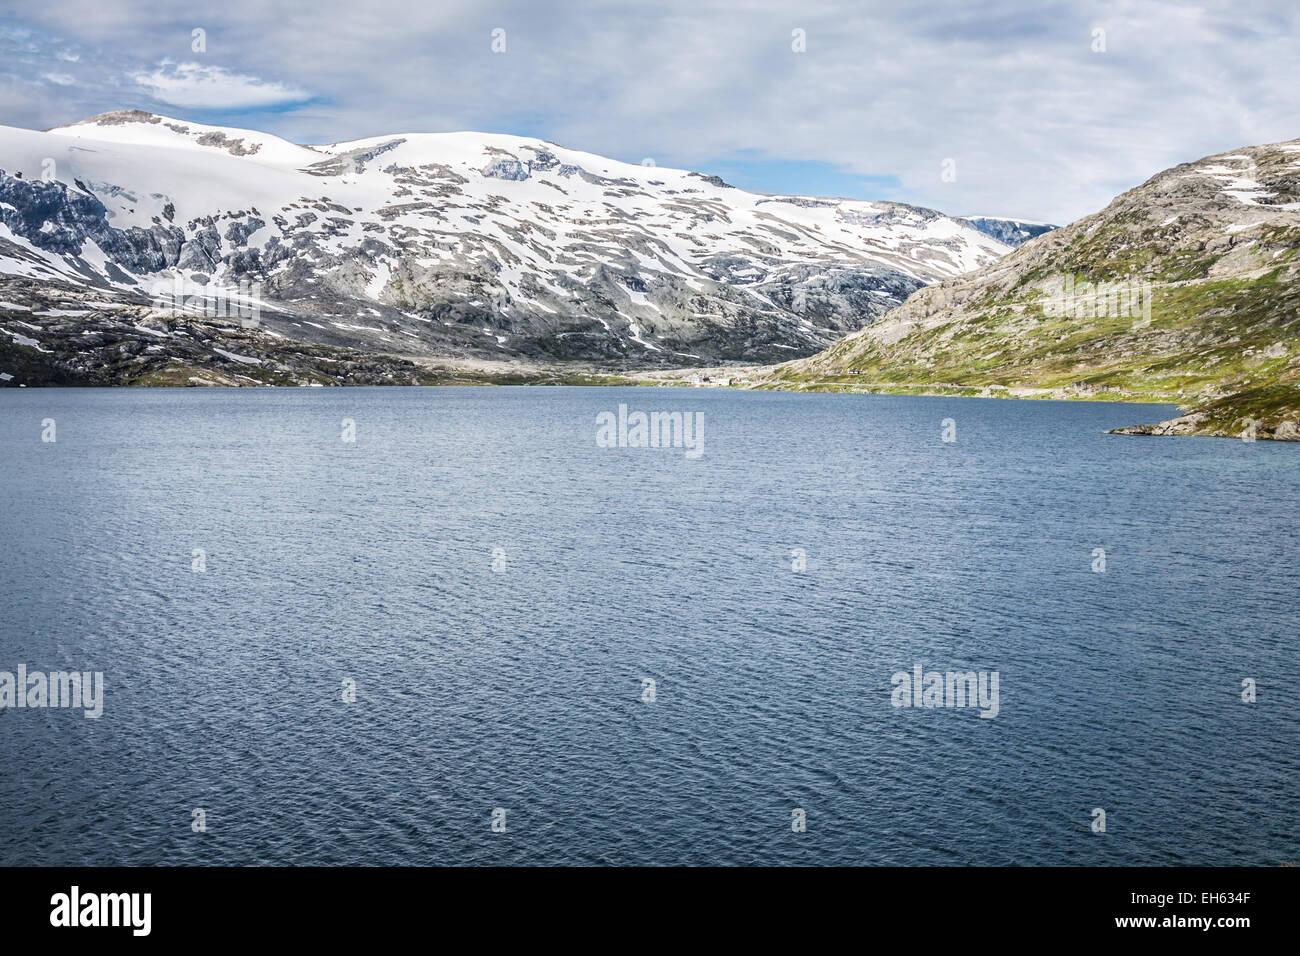 Mountain scenery in Jotunheimen National Park in Norway - Stock Image